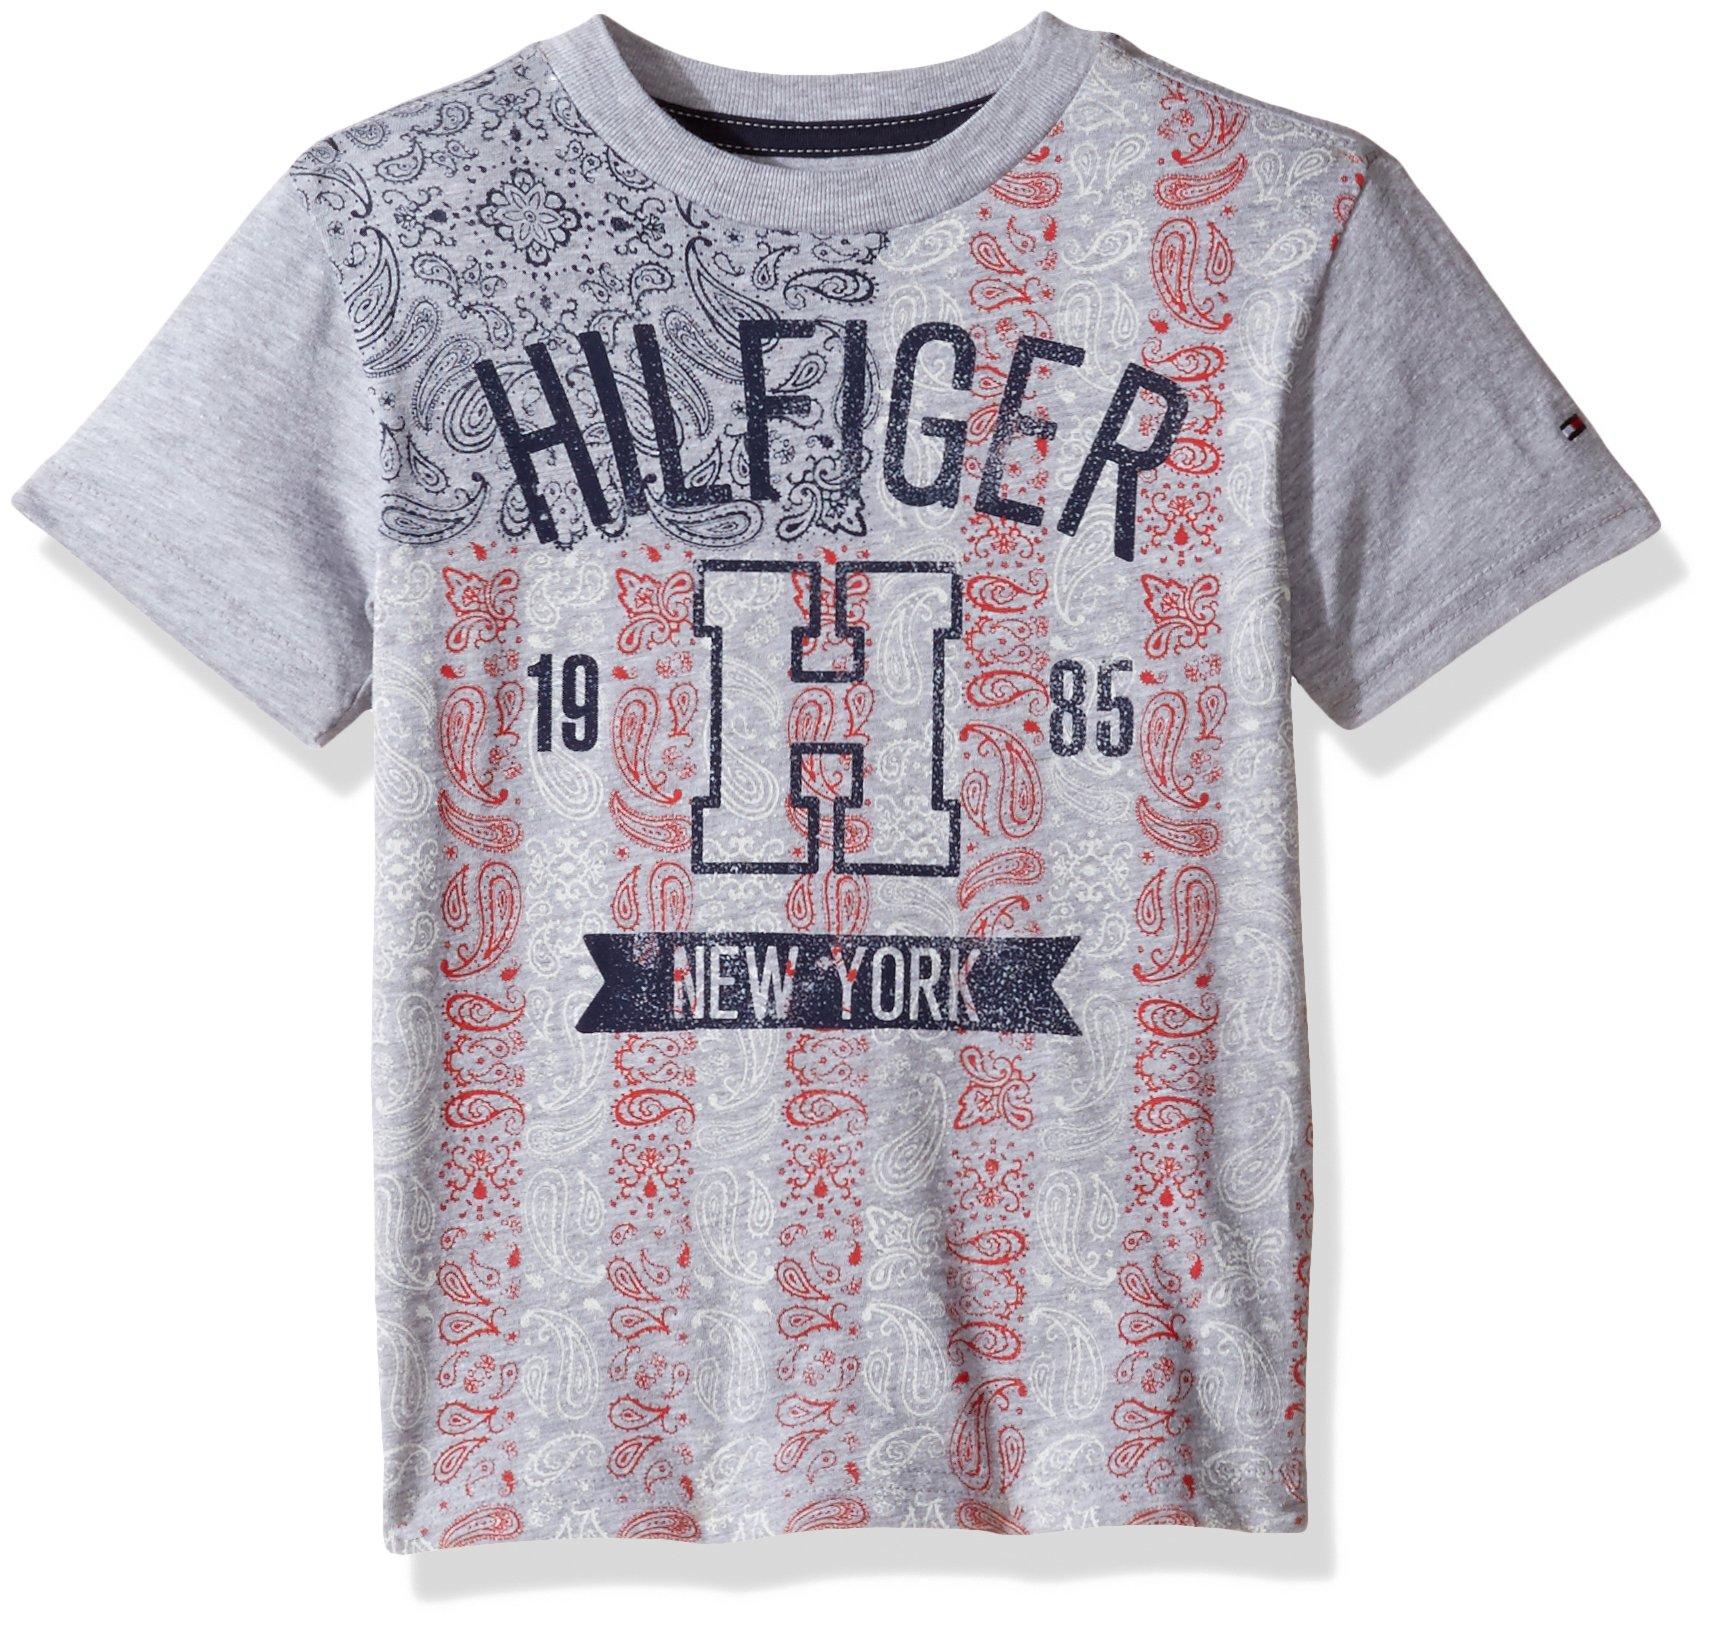 7e62d1d7 Galleon - Tommy Hilfiger Boys' Big Short Sleeve Crew Neck Flag Graphic T- Shirt, Grey Heather Large (16/18)